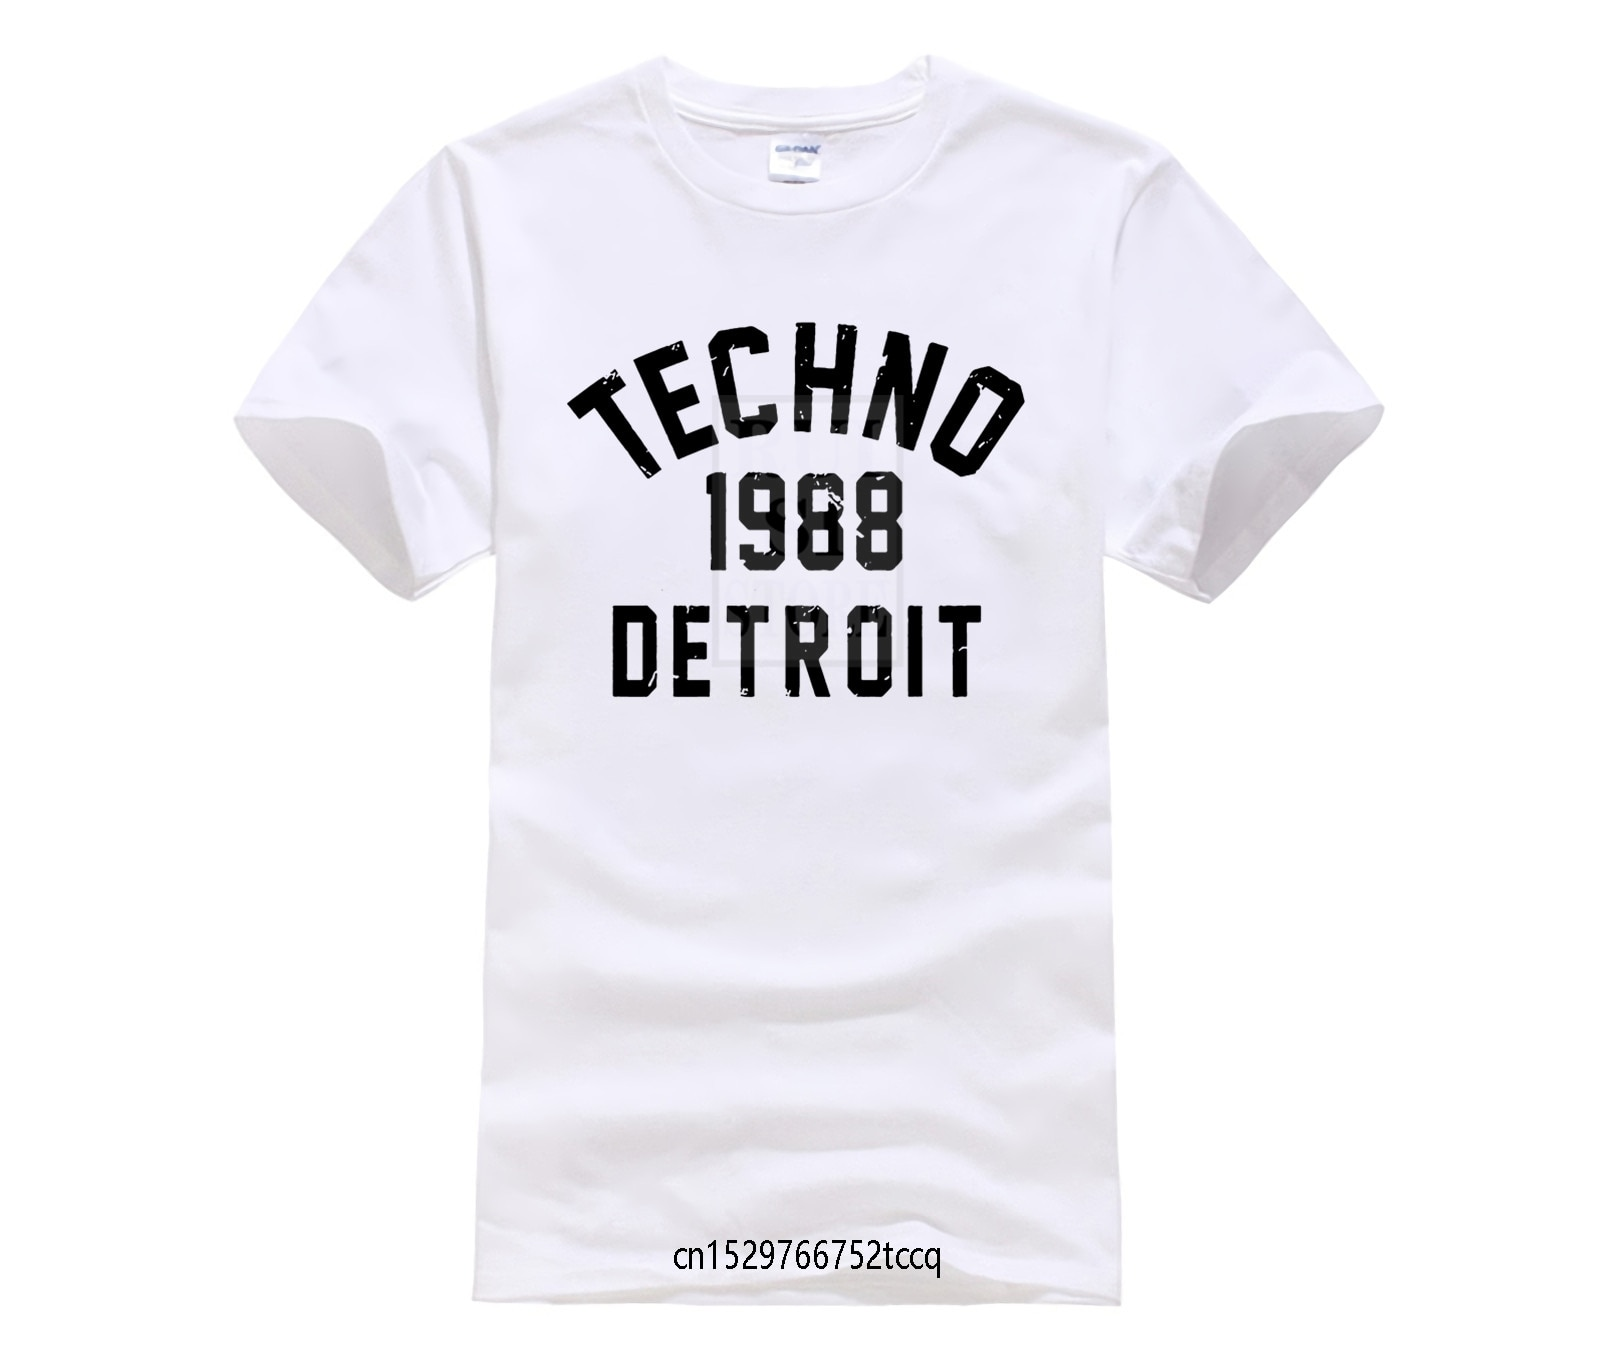 Detroit Techno 1988 T-Shirt Juan Atkins Kevin Saunderson Printed T Shirt women Cotton T-Shirt Printing